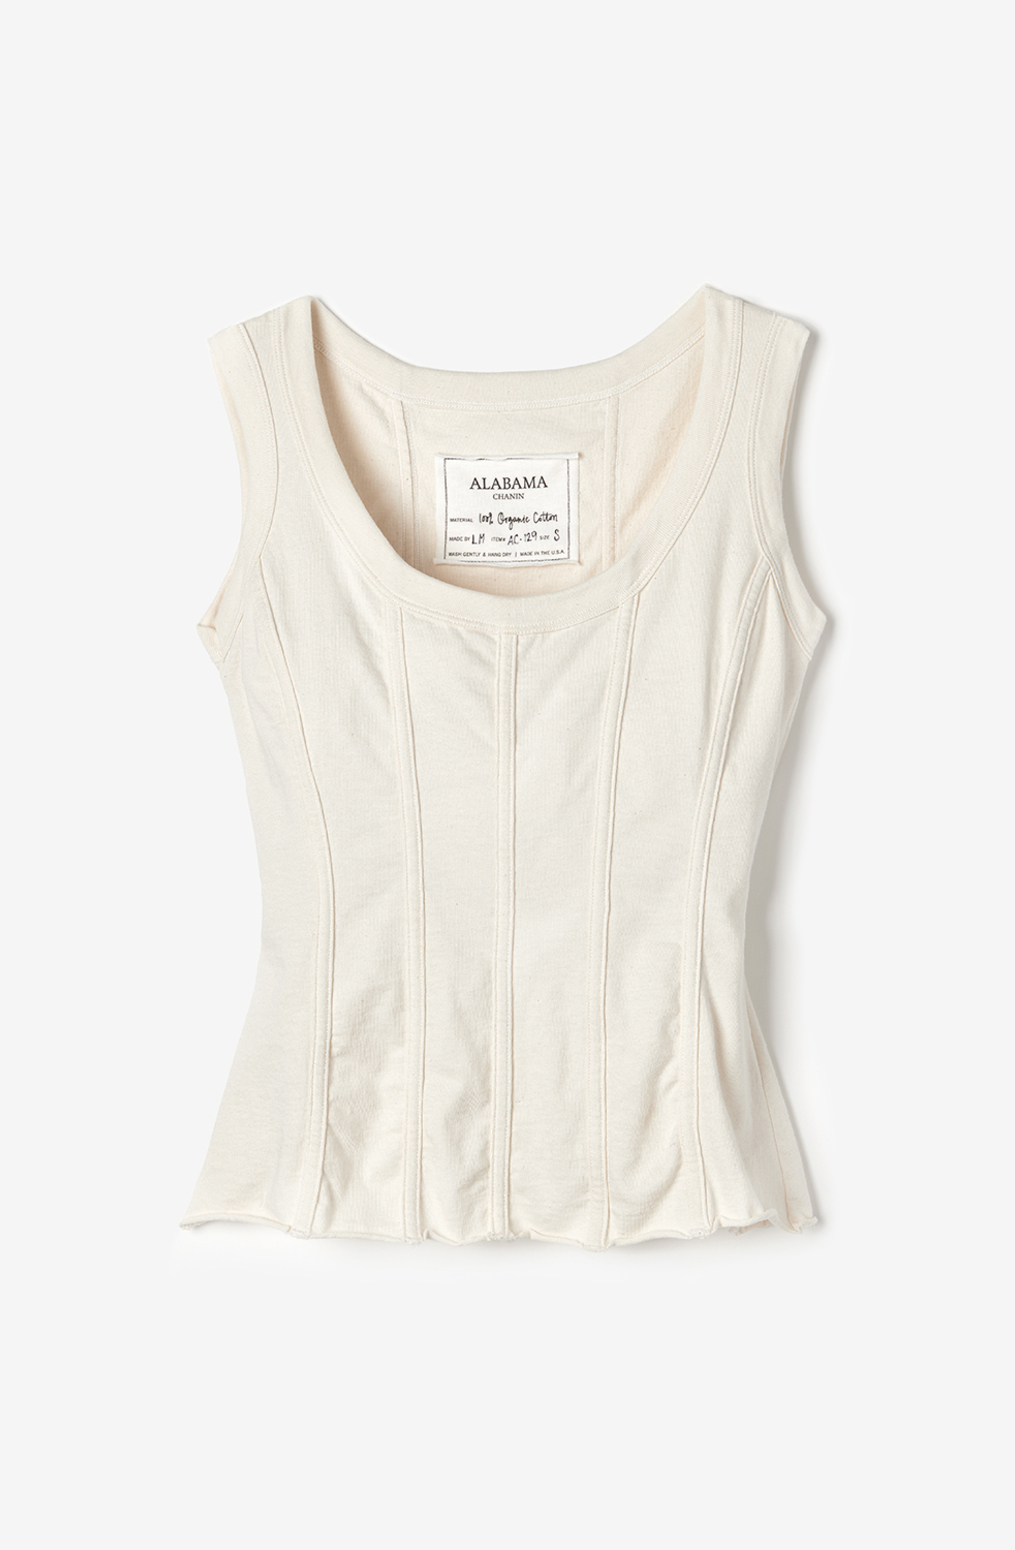 Alabama chanin womens fitted corset organic cotton top 1